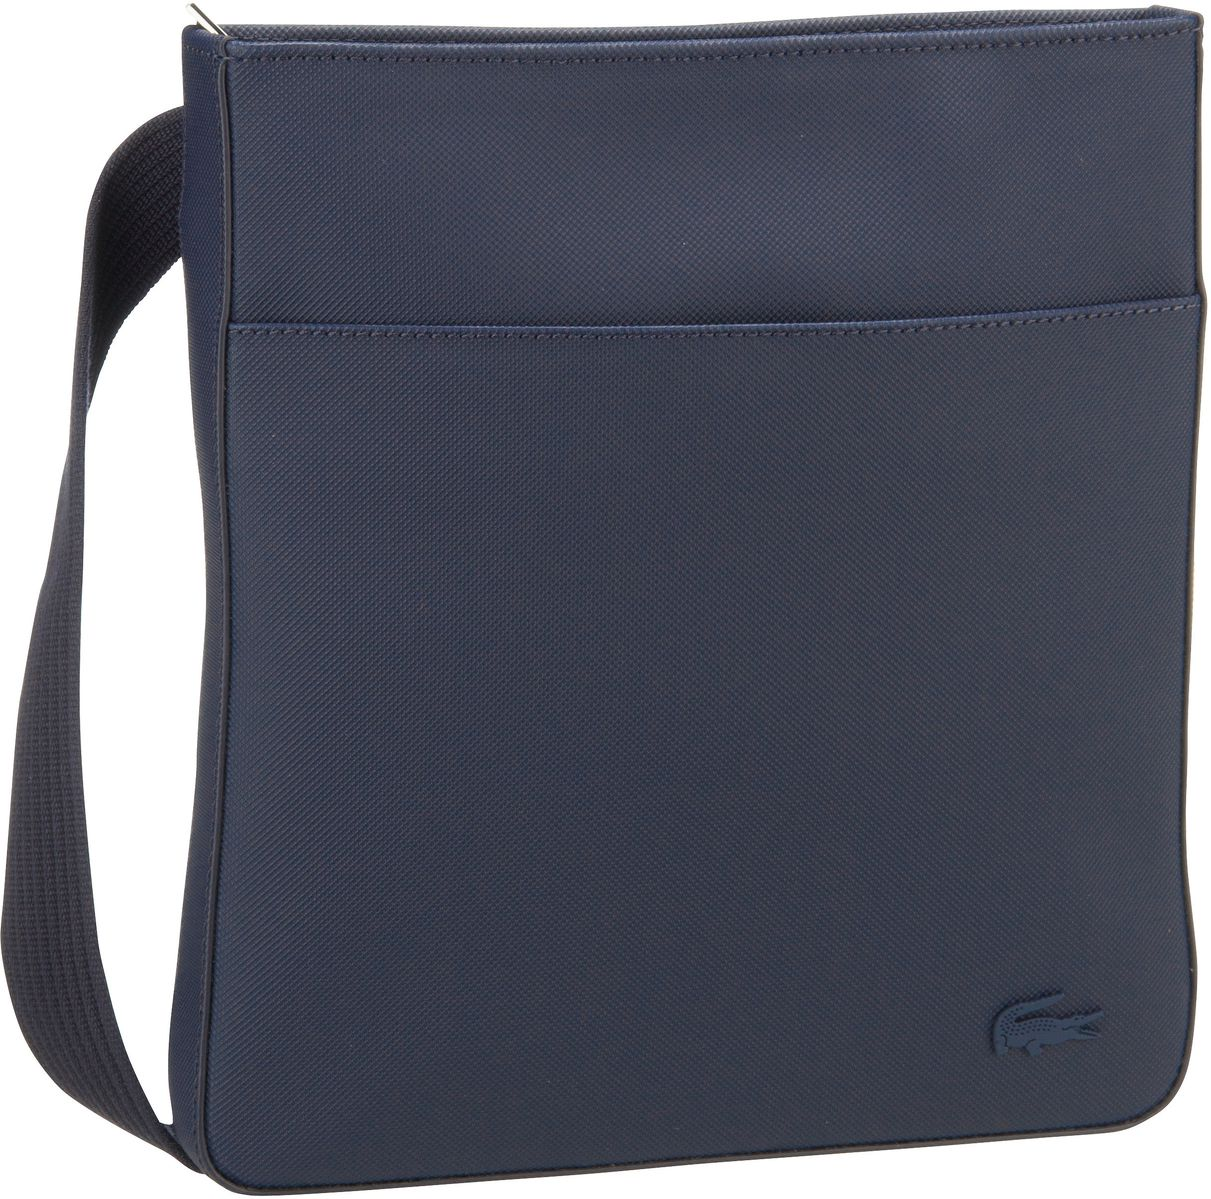 Umhängetasche Men's Classic Crossover Bag 2850 Peacoat